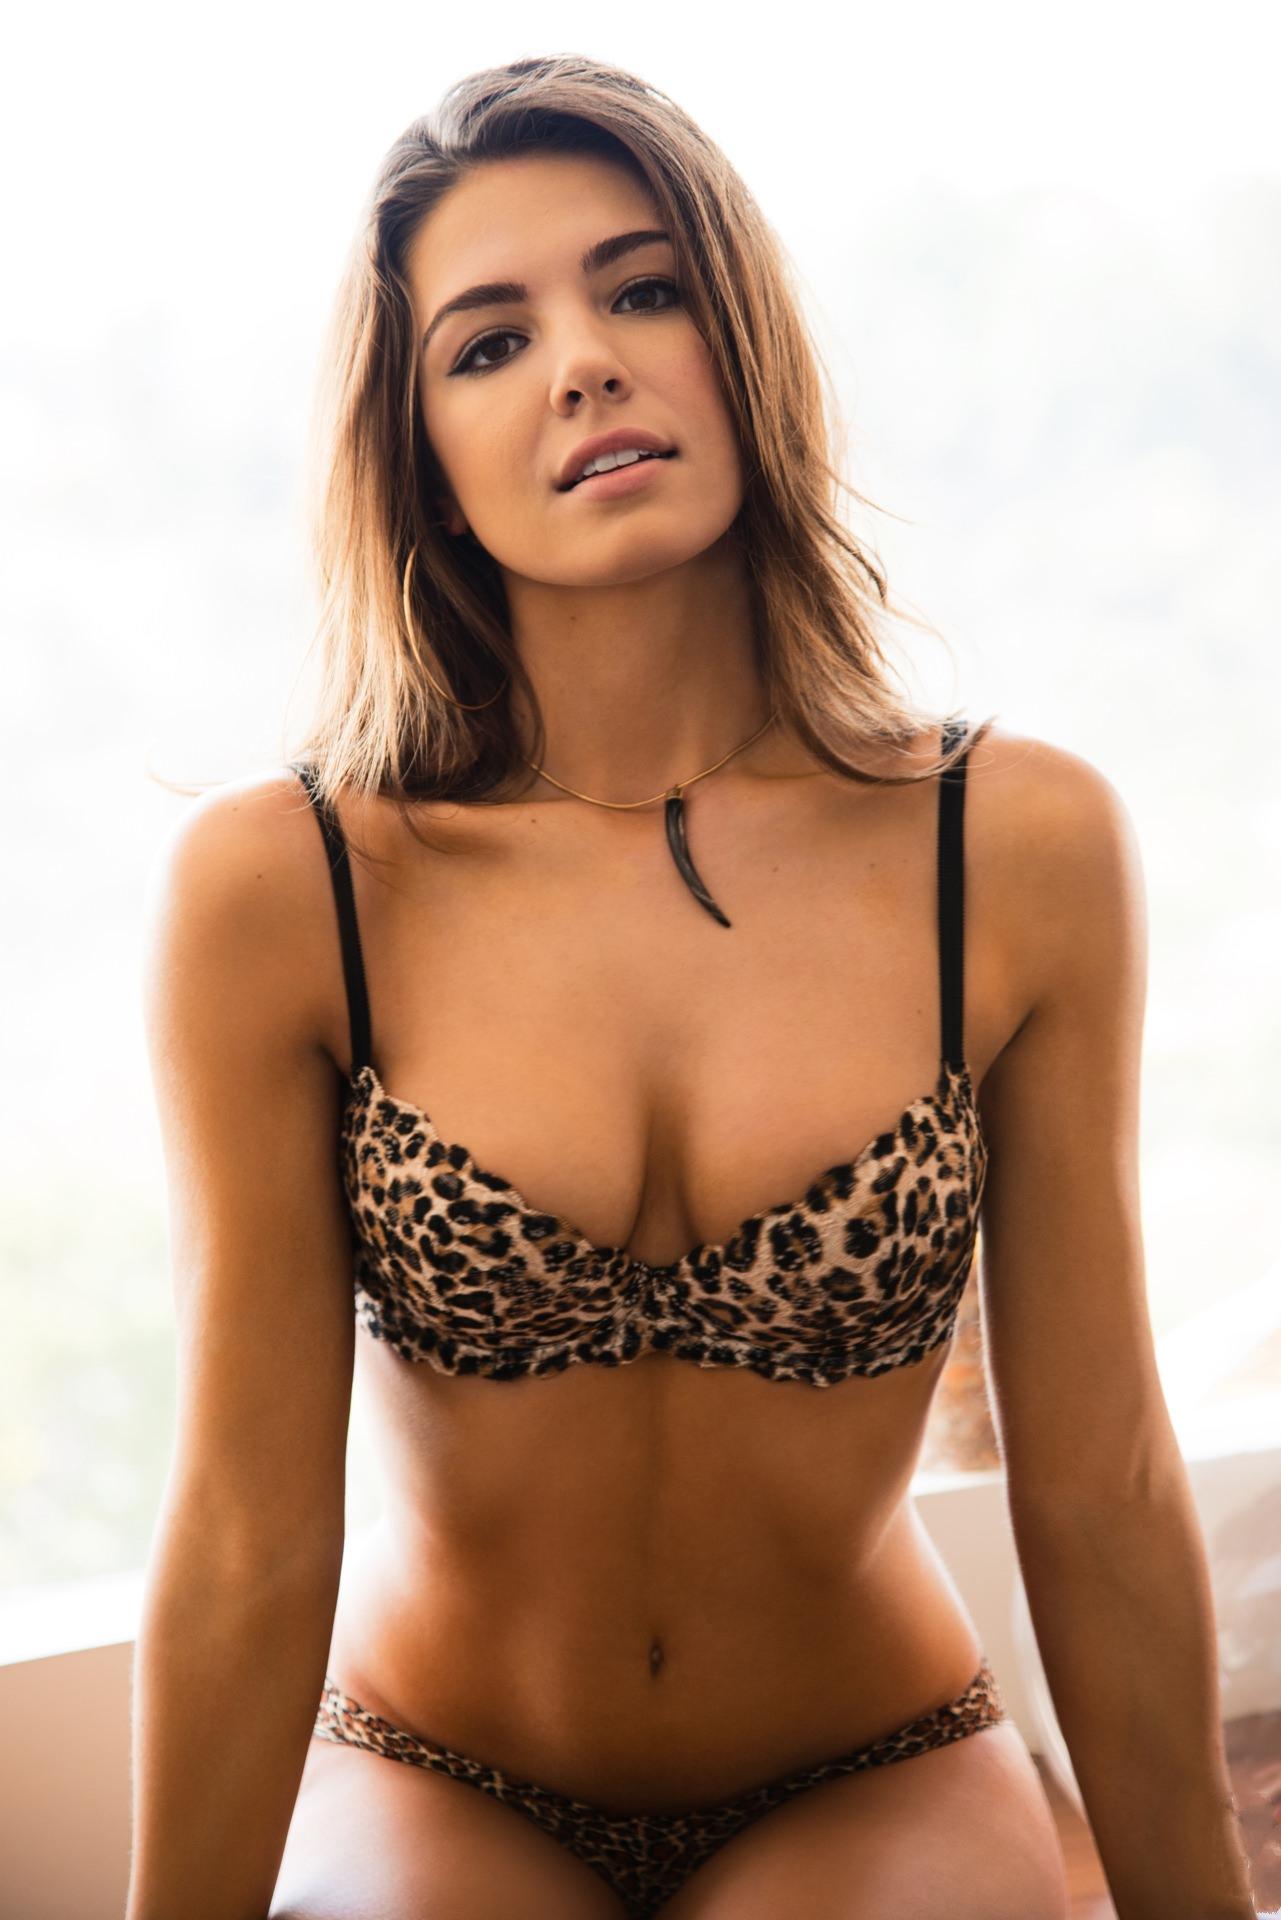 ashley jessica sexy woman lingerie bikini fashion erotic skin glamour pretty model